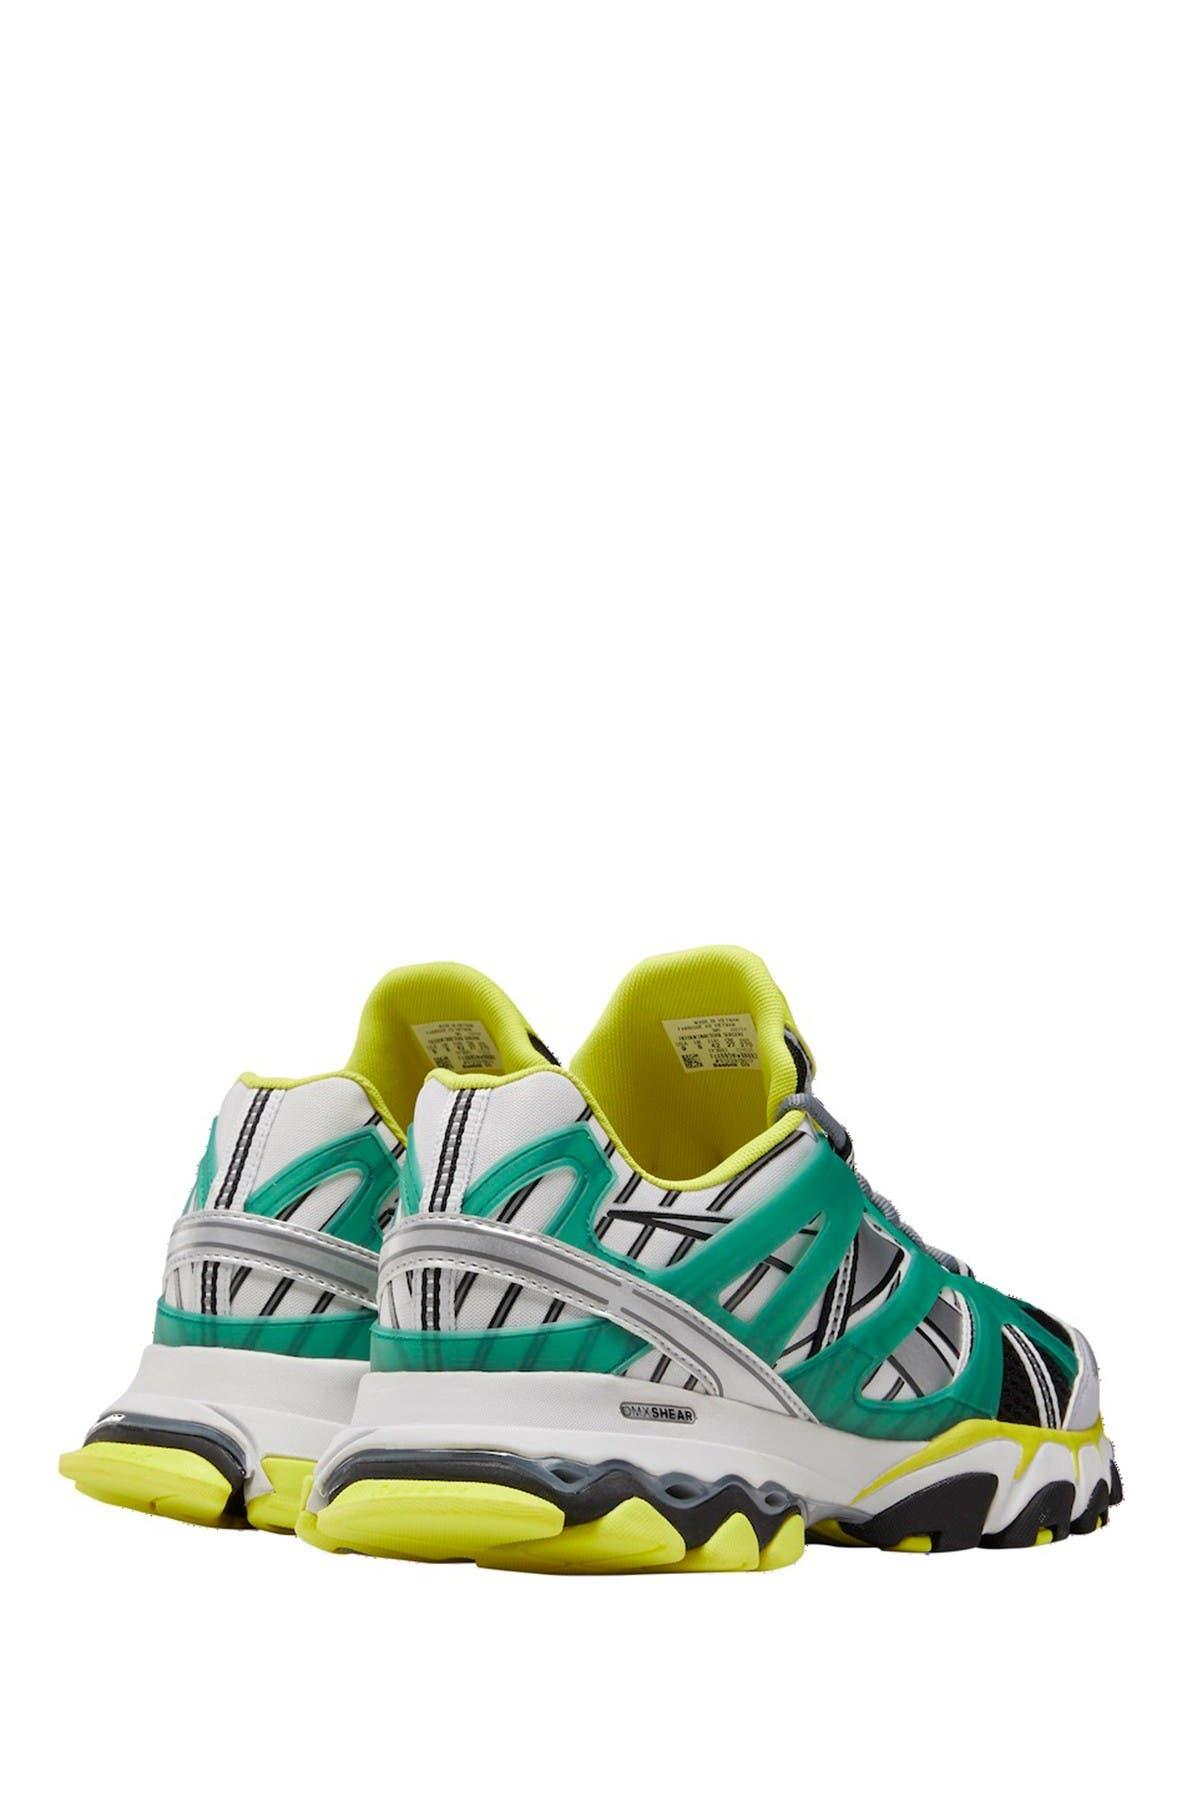 Image of Reebok DMX Trail Sneaker